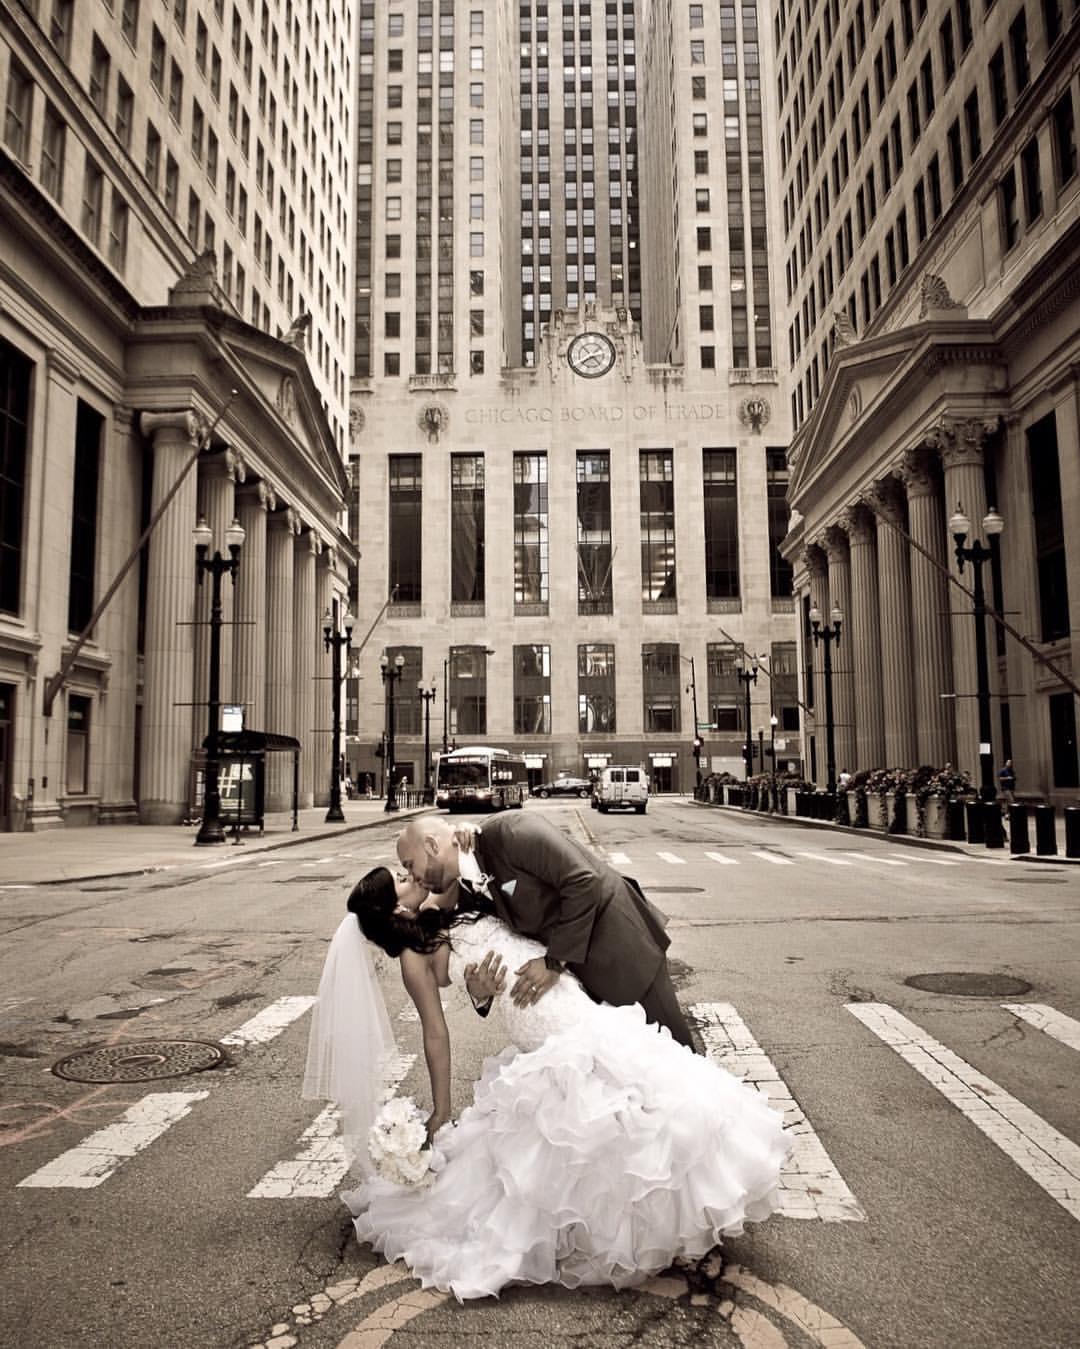 Wedding Day - Board of Trade - Chicago, IL